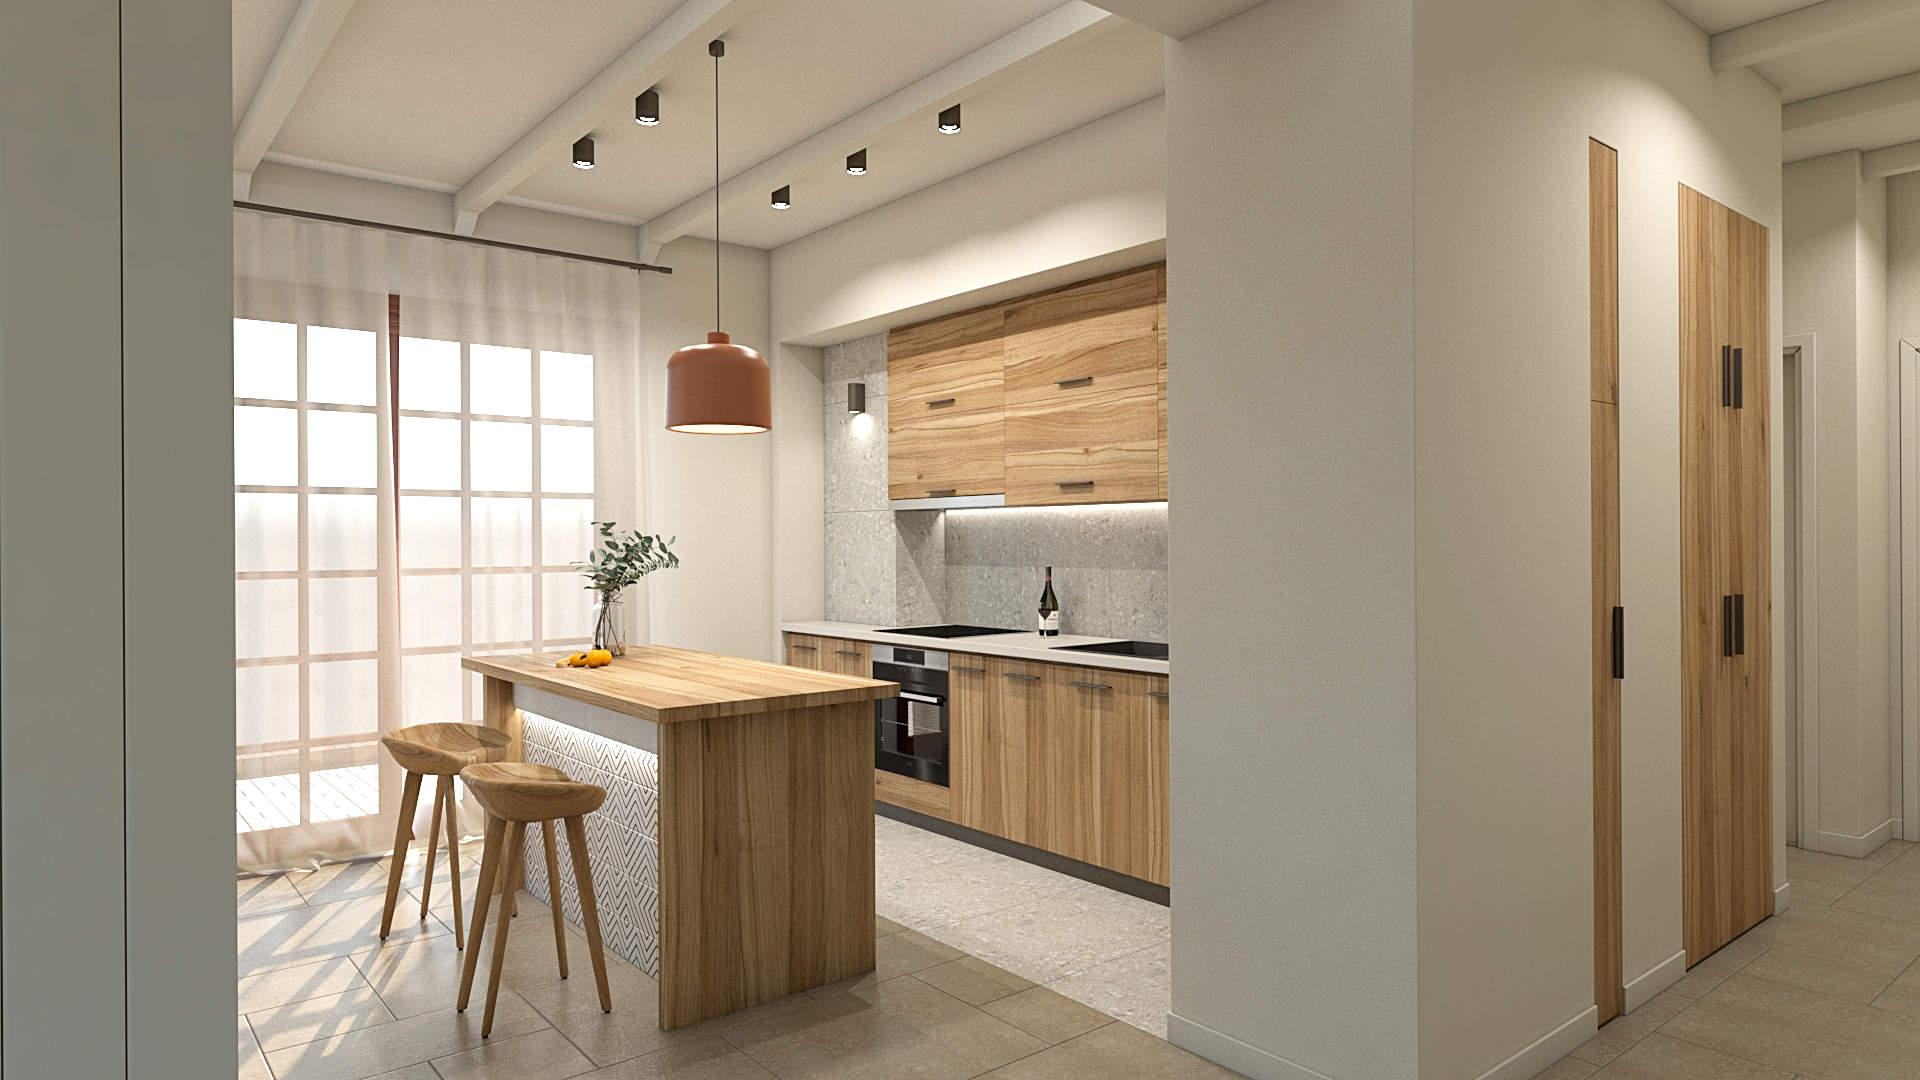 apartment renovation, kitchen, kitchen island, wood and terrazzo tiles. Μερική αναδιαμόρφωση κατοικίας, κούζινα, νησίδα, ξύλο και μωσαϊκά πλακάκια.